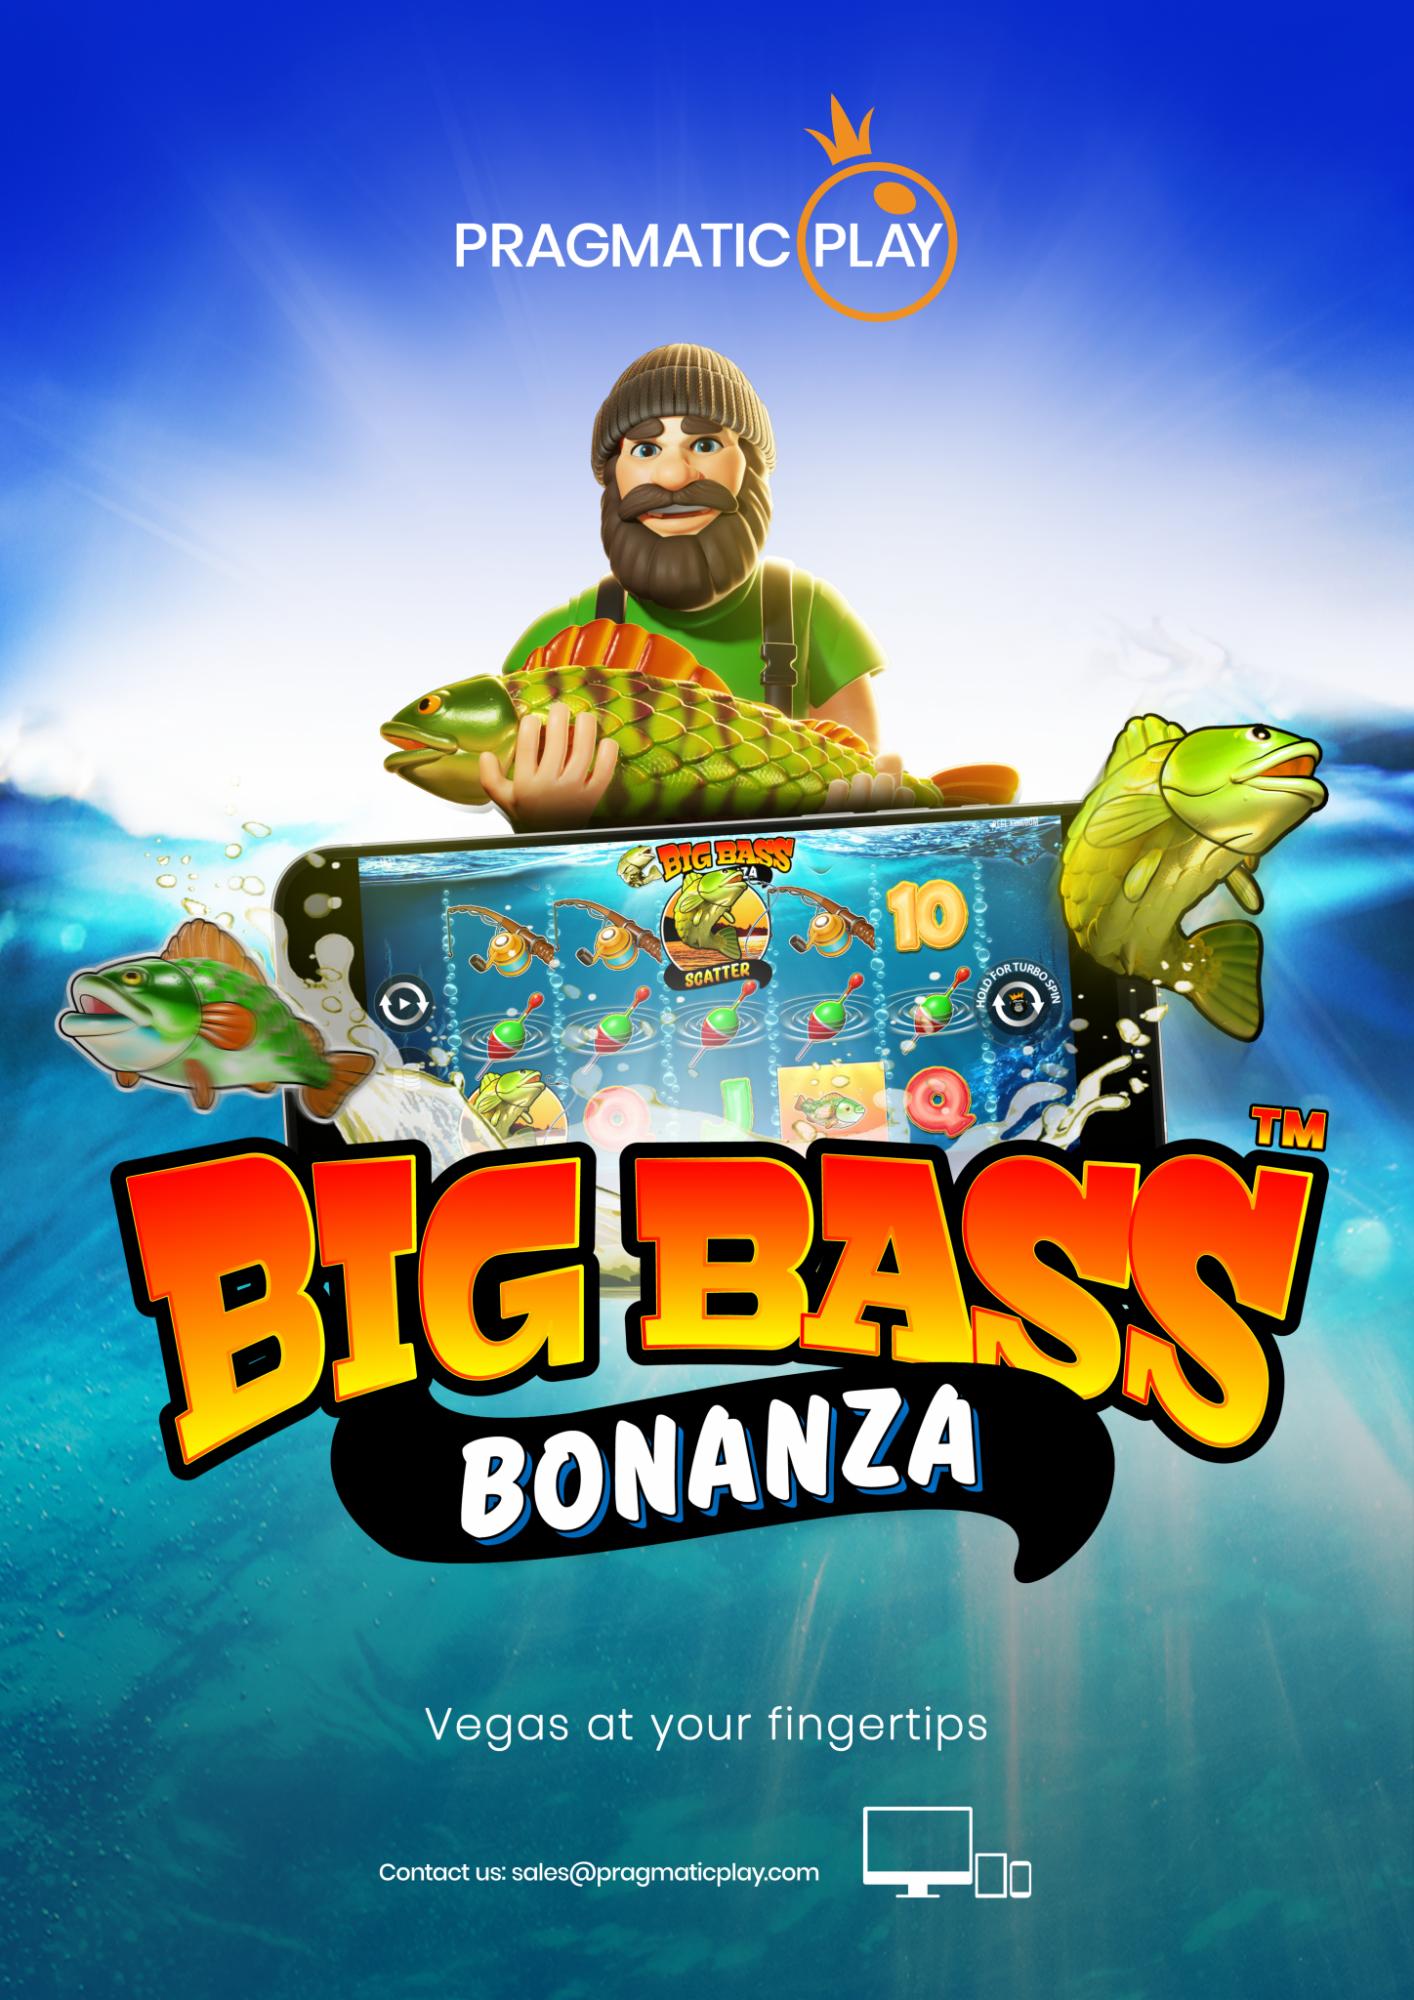 Big Bass Bonanza nyhed